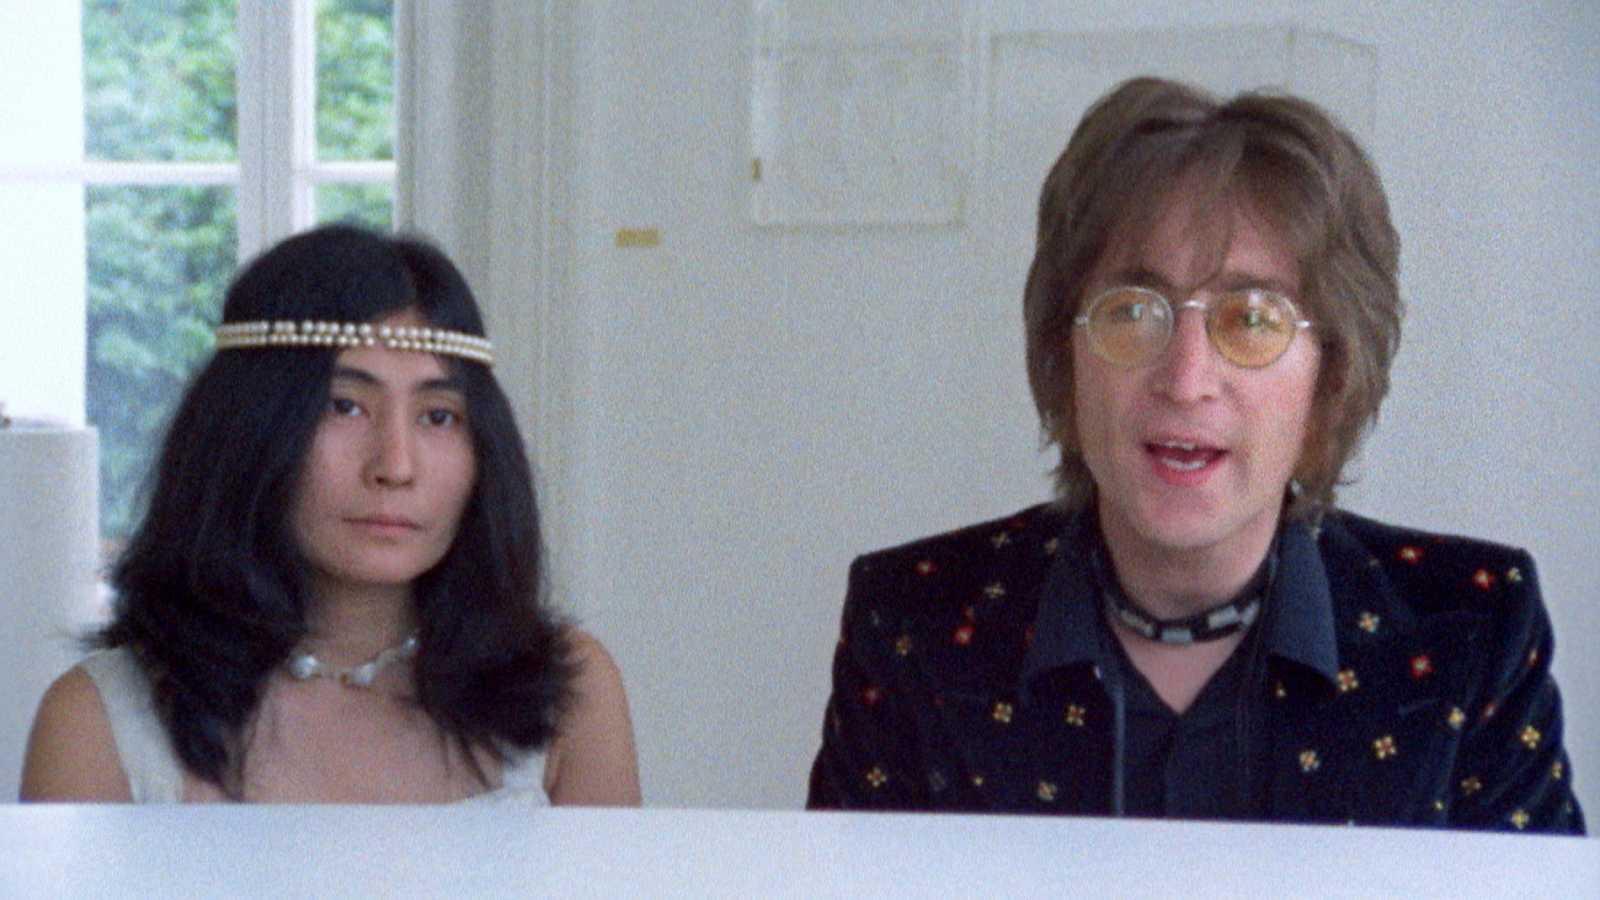 Vídeo de 'Imagine', de John Lennon, con imágenes inéditas